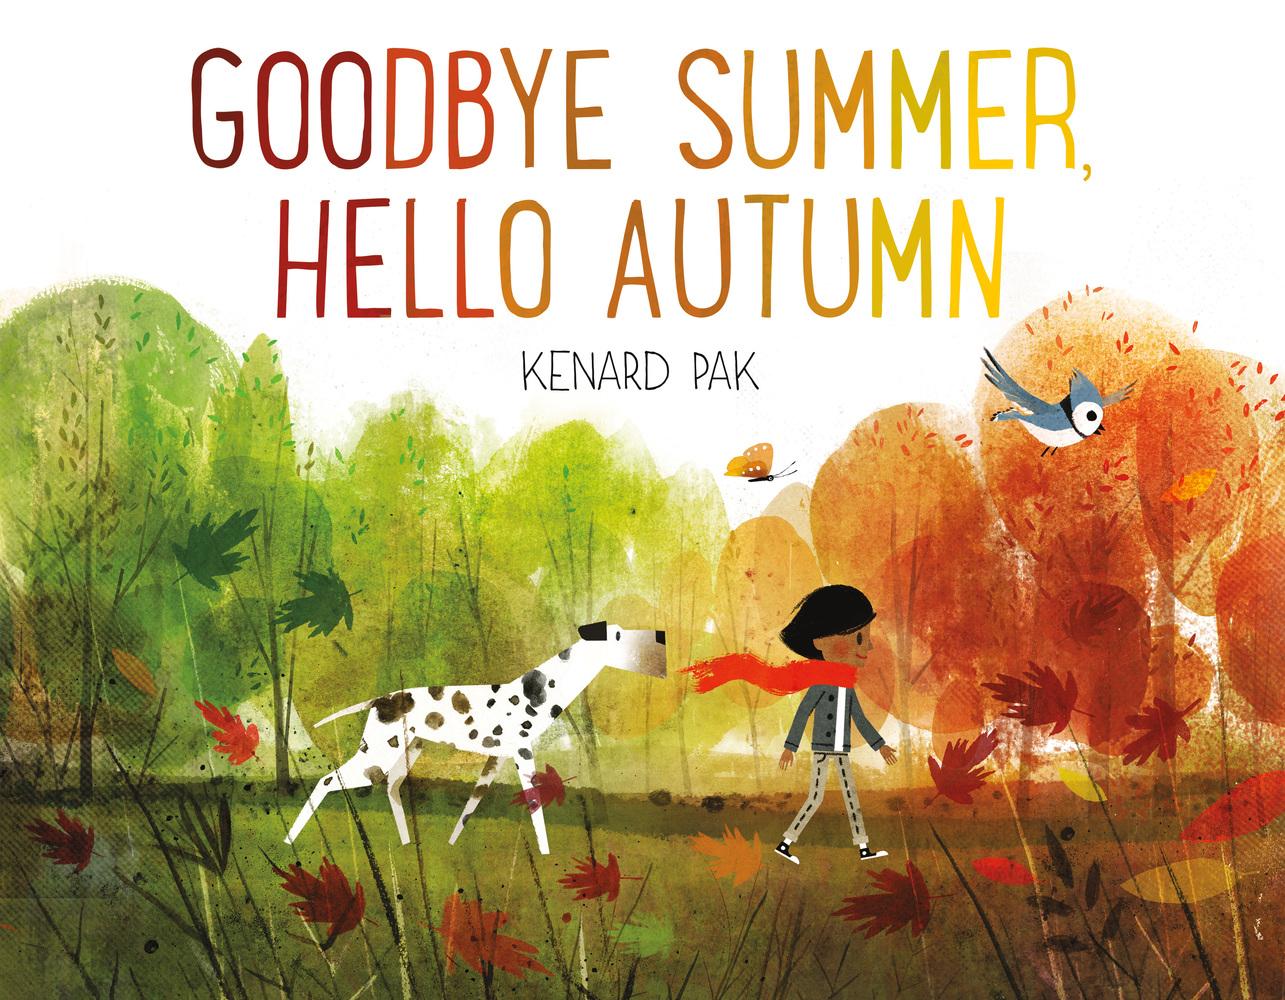 Fall Harvest Wallpaper Hd Goodbye Summer Hello Autumn Kenard Pak Macmillan